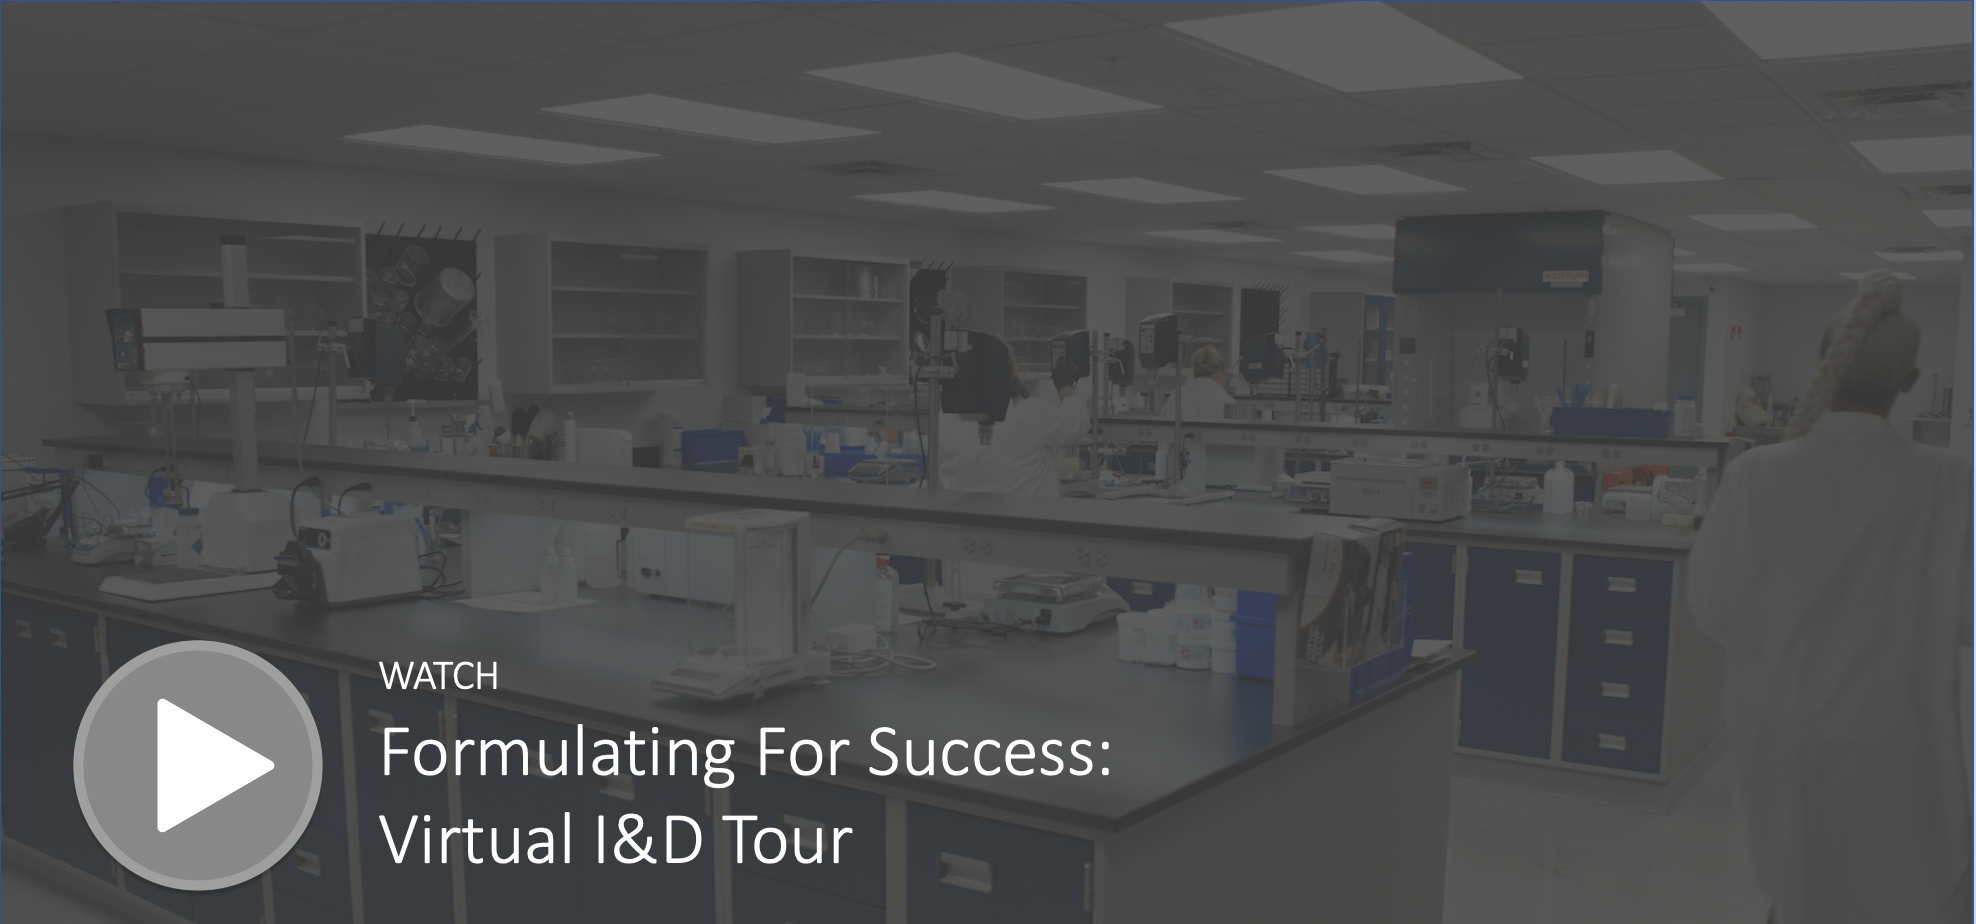 Formulating for Success - Virtual I&D Tour